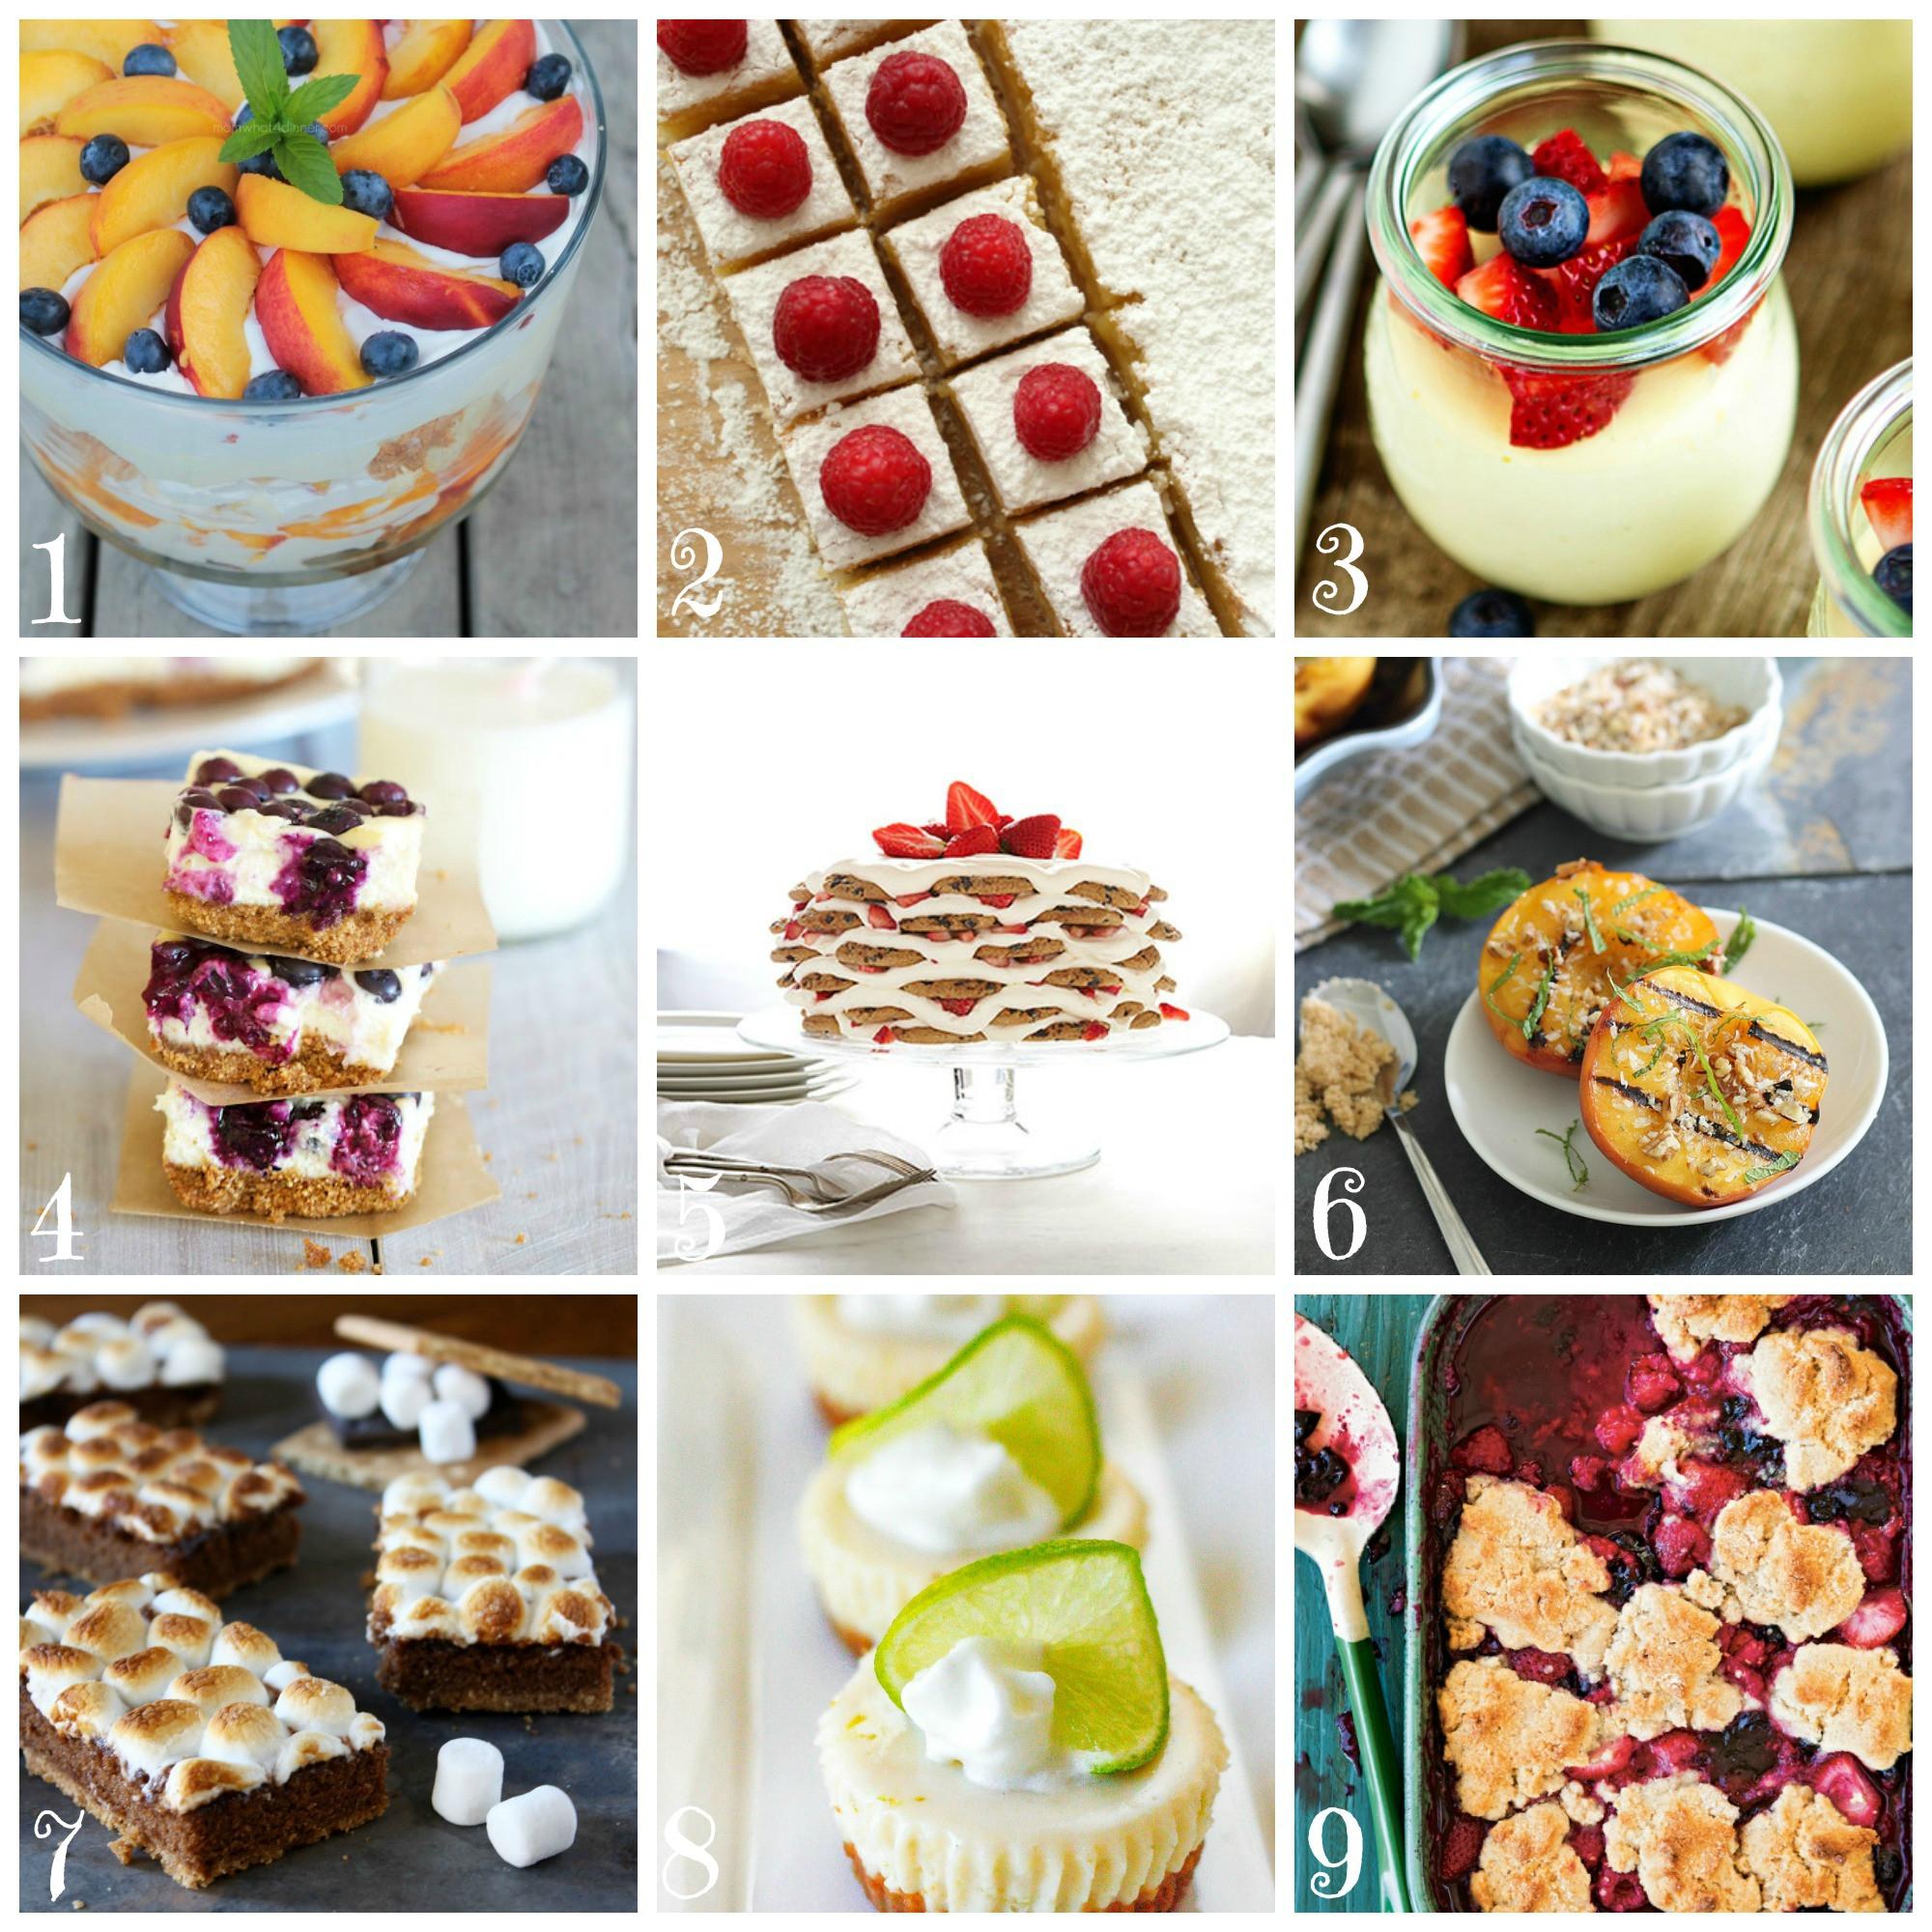 Best Summertime Desserts  Best Summer Dessert Recipes • CakeJournal